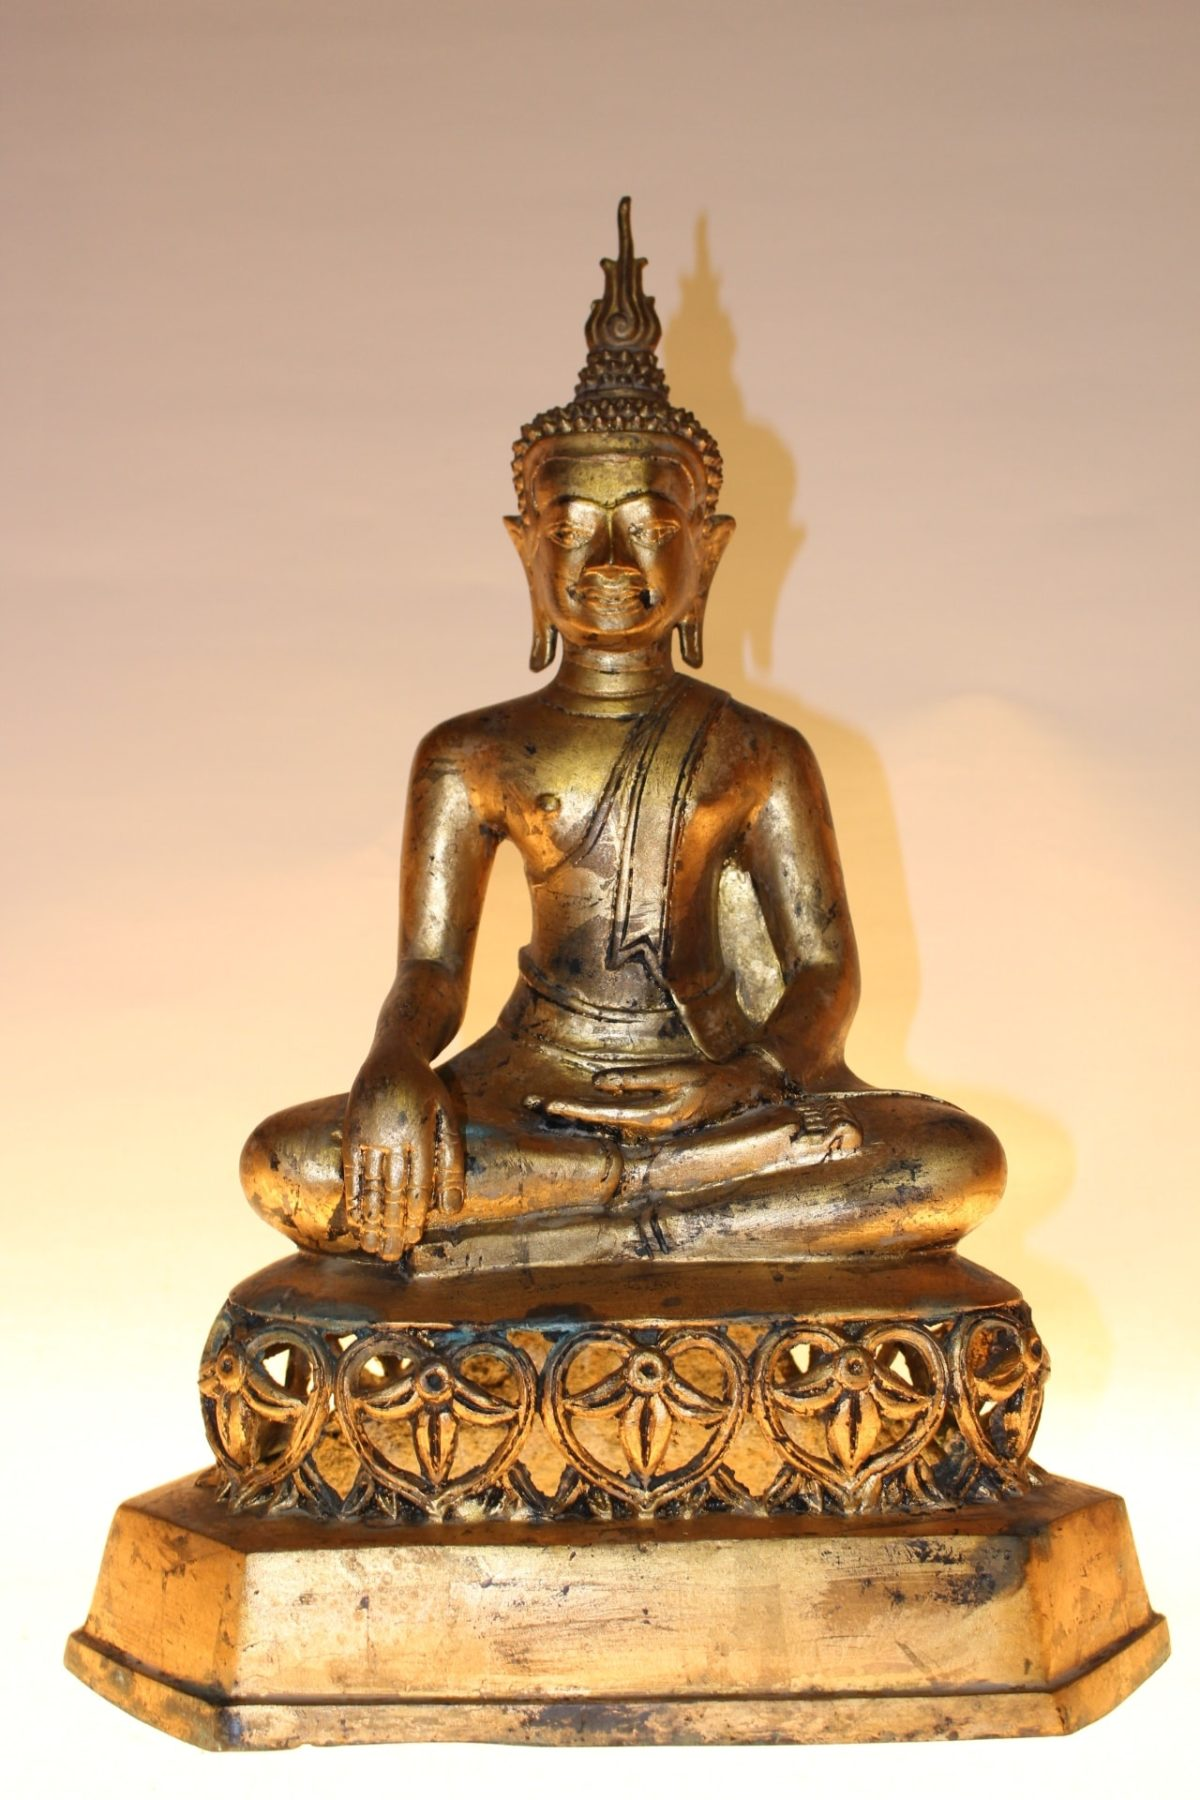 Bronze Buddha Figur, 44 x 32 x 20 cm